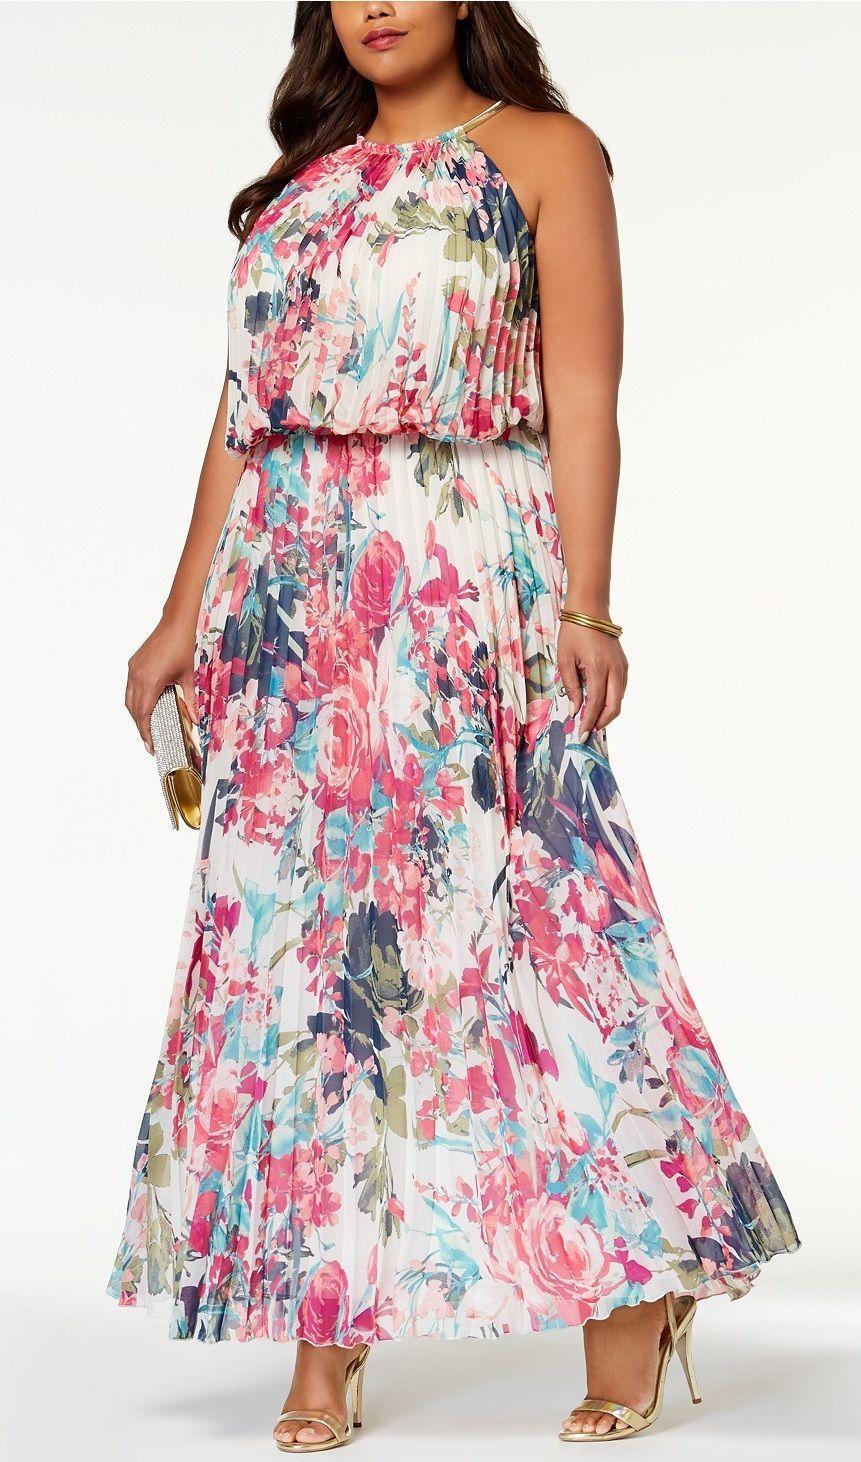 Plus Size Blouson Halter Gown | Tenue | Pinterest | Hippie bohemio ...